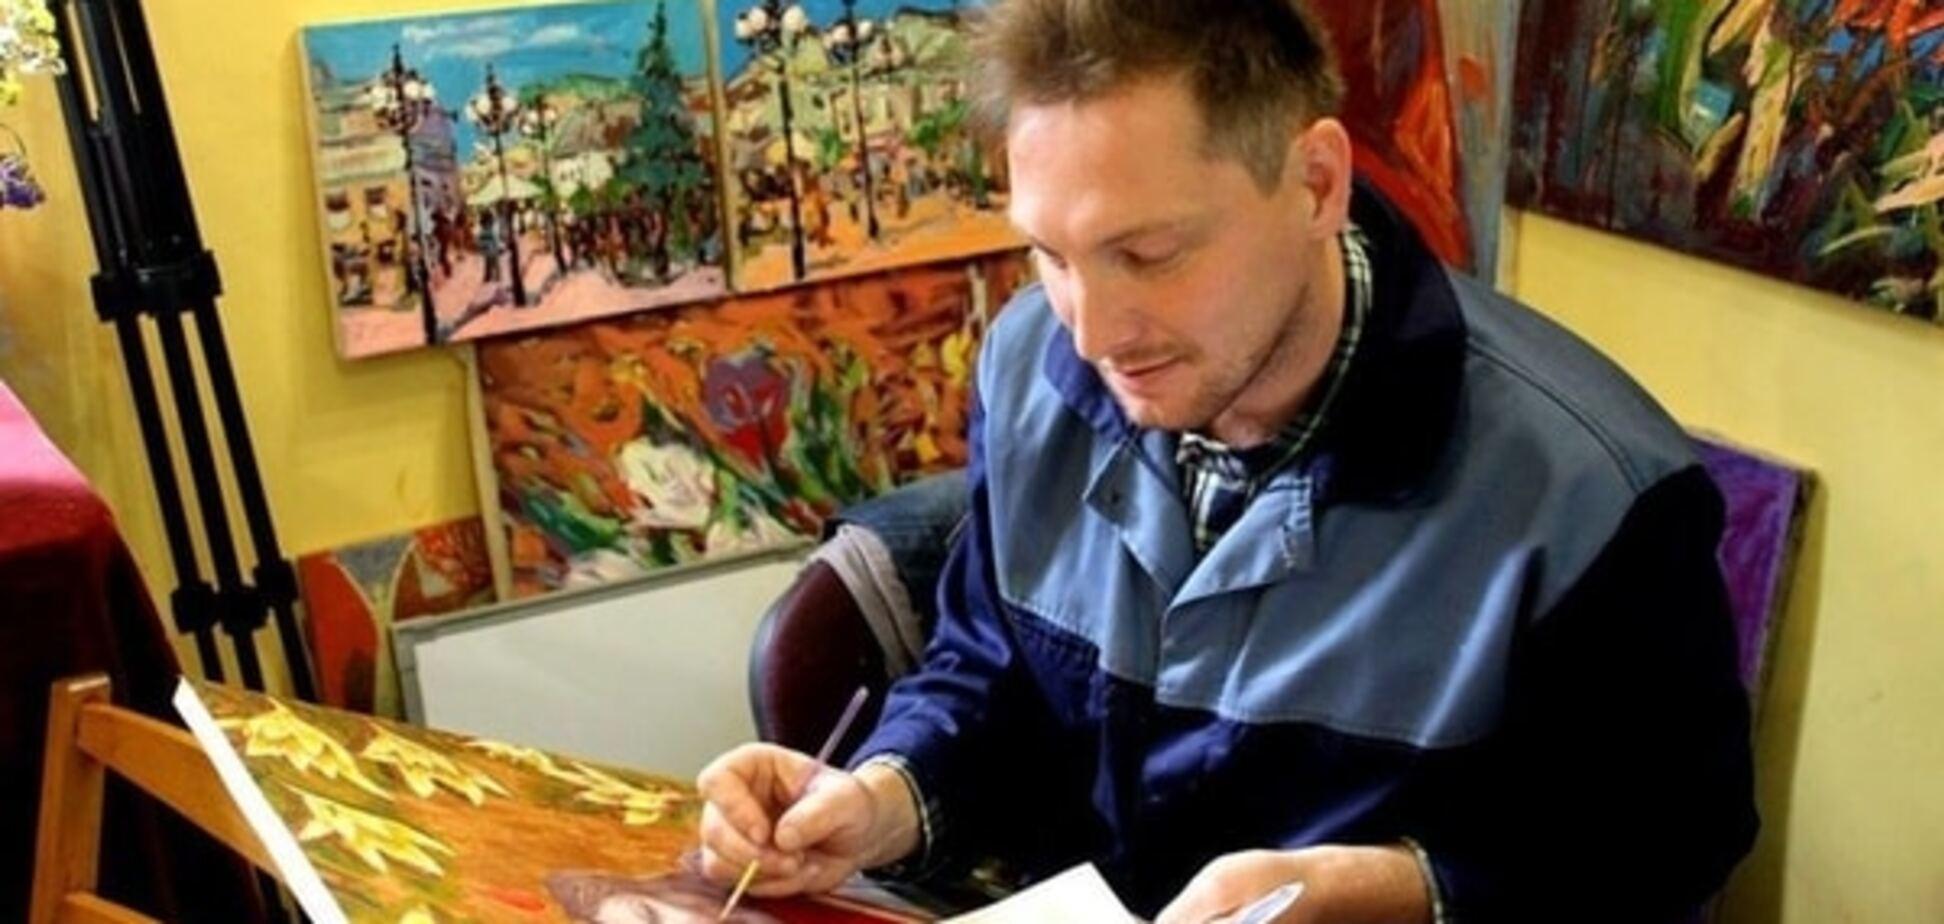 Борьба за жизнь: как тяжелобольные украинцы зарабатывают на лечение